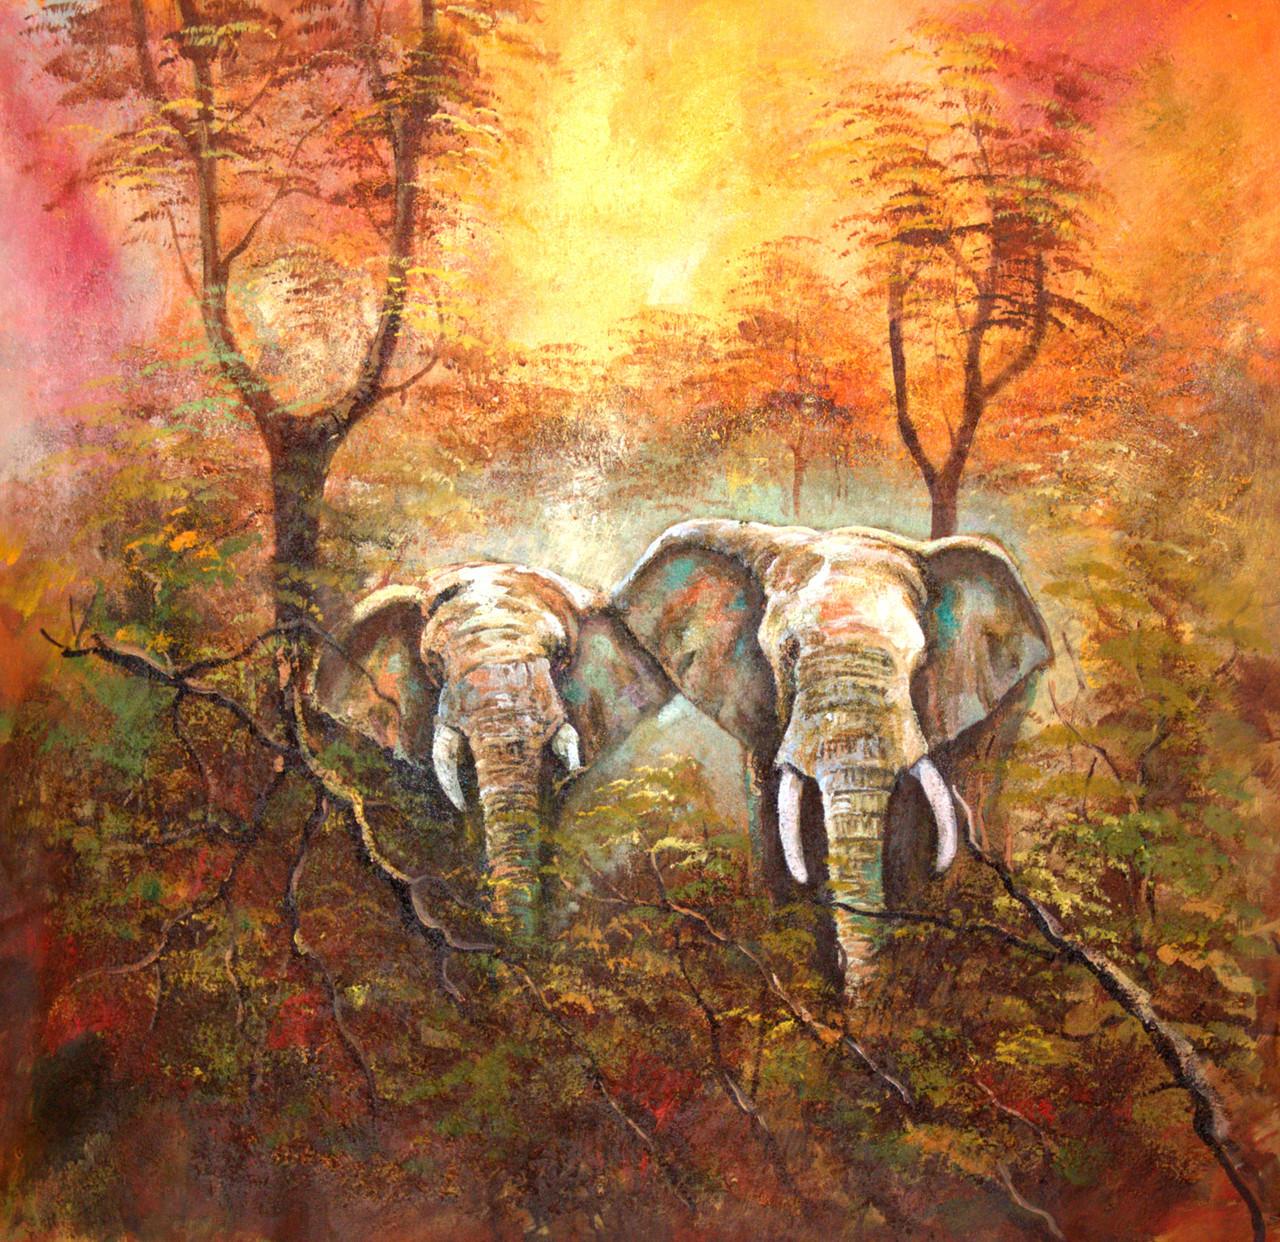 buy good morning handmade painting by ram achal code art 1522 15150